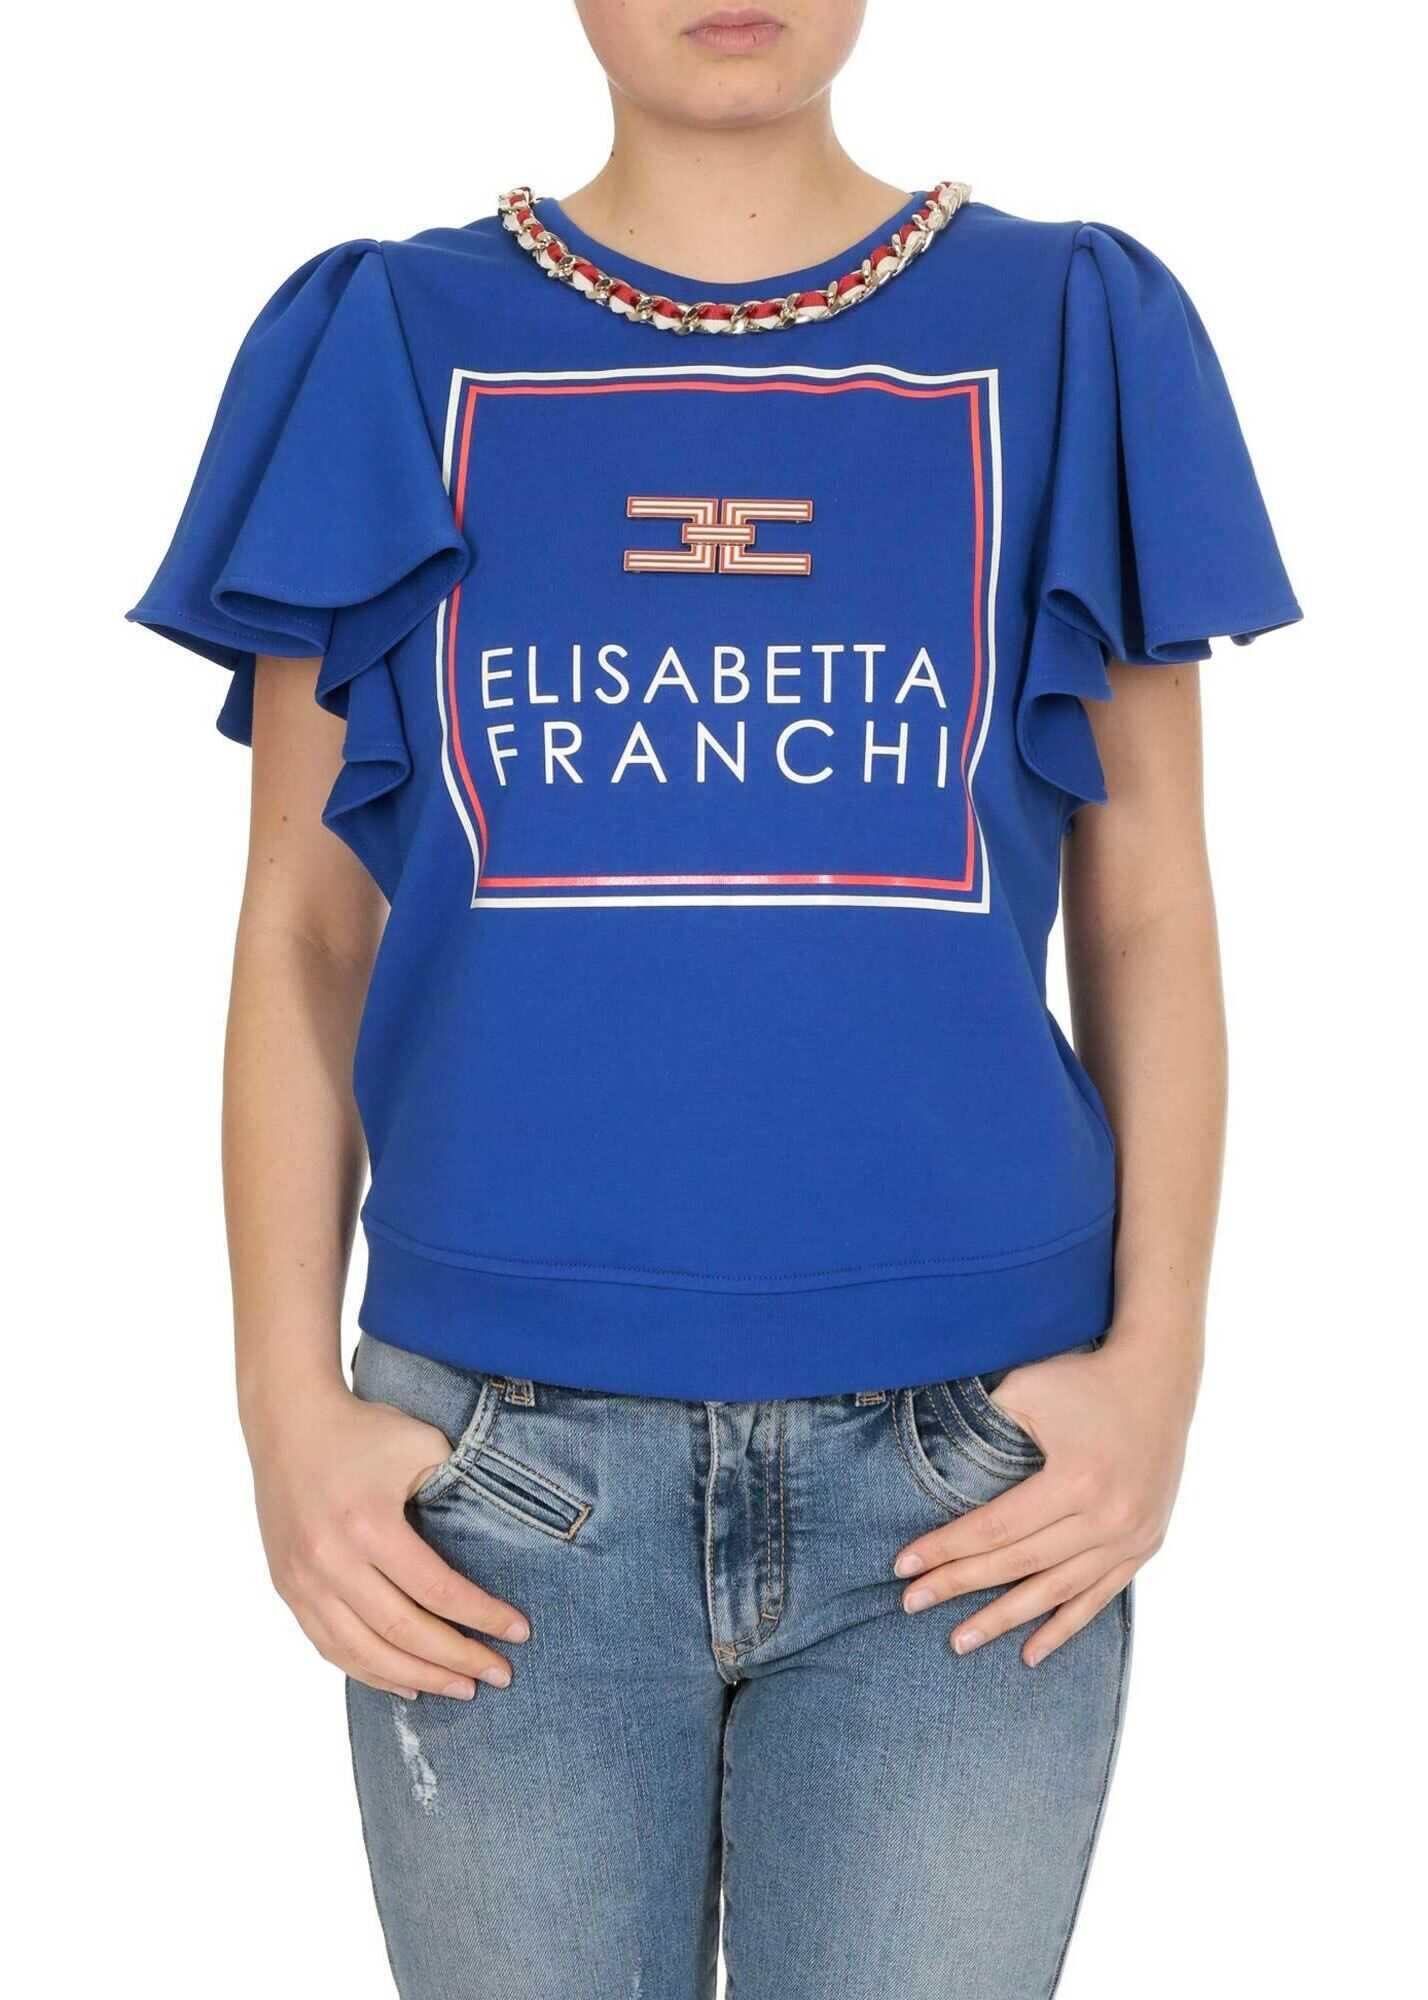 Elisabetta Franchi Sweater In Cobalt Blue With Flounces Blue